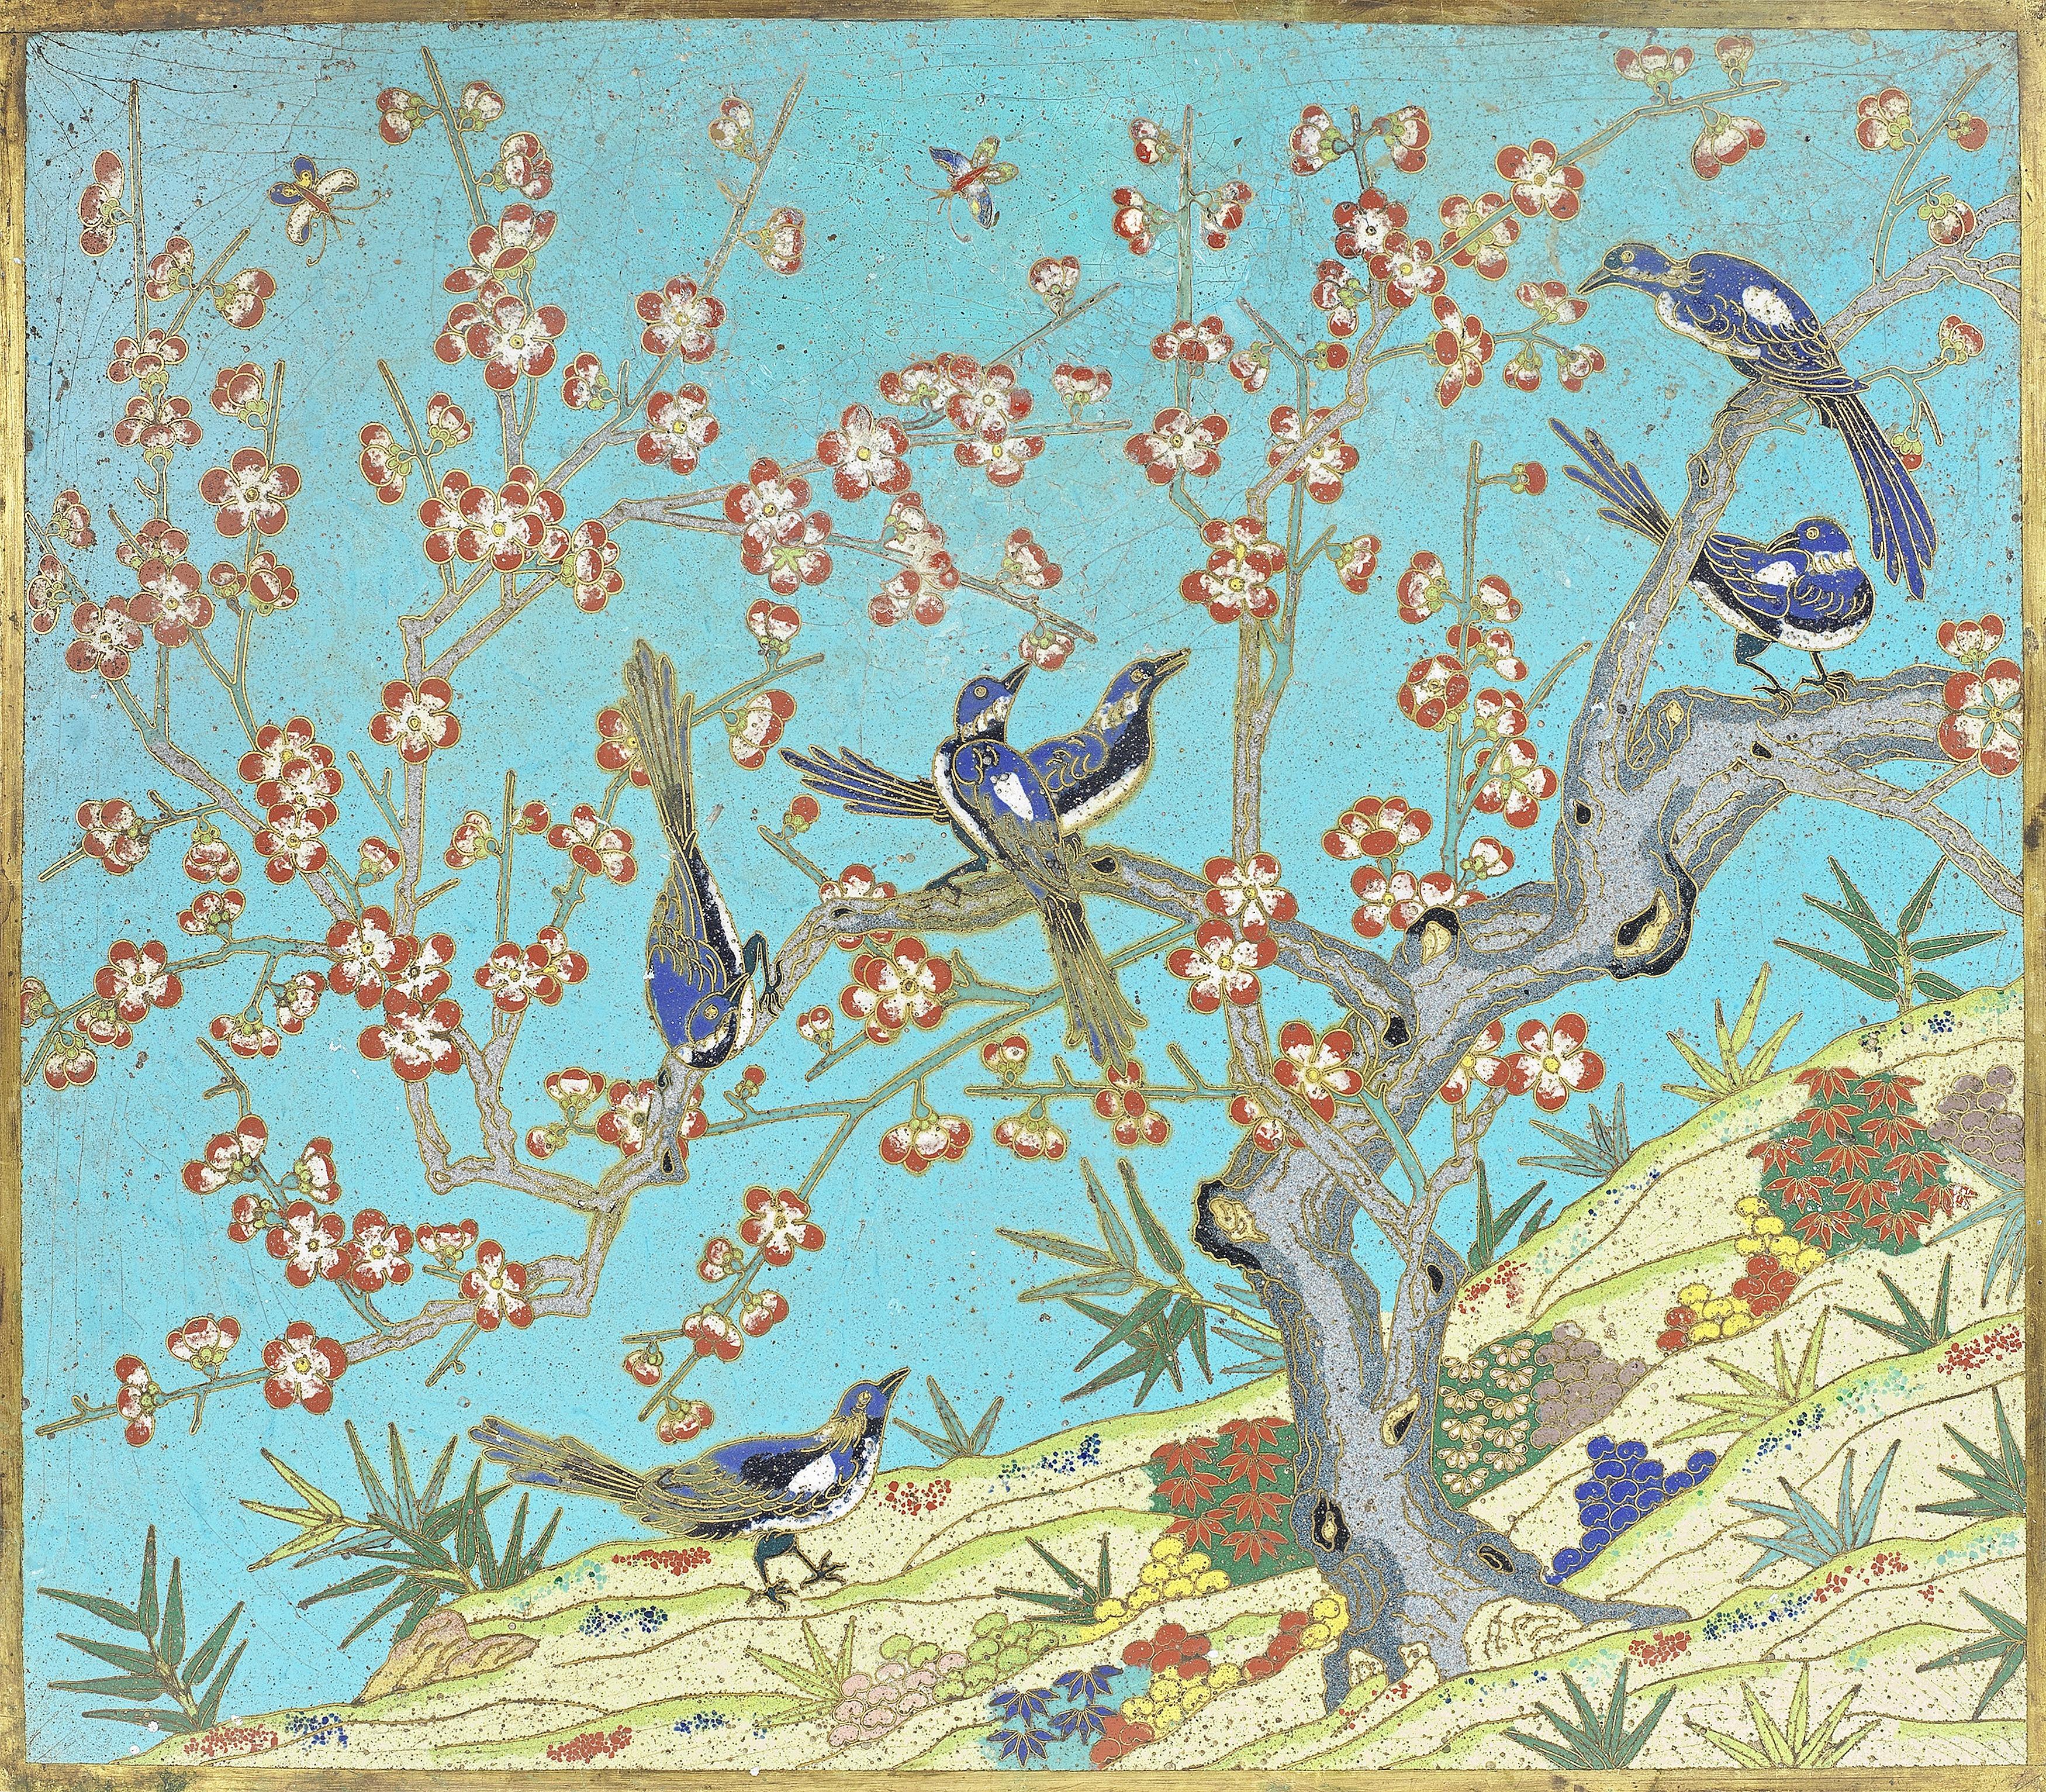 A FINE CLOISONNÉ ENAMEL 'MAGPIES AND PRUNUS' RECTANGULAR PLAQUE Qianlong/Jiaqing